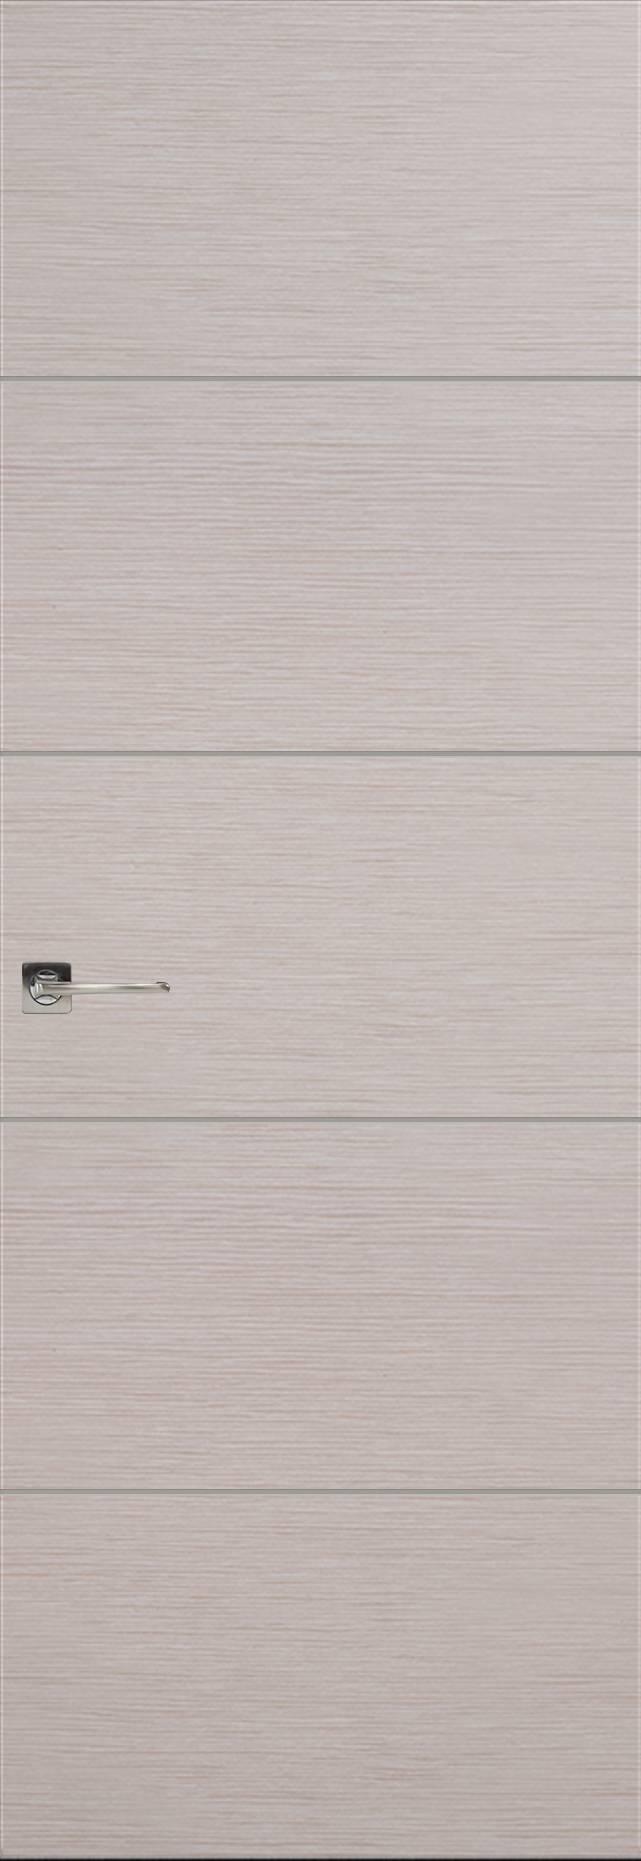 Tivoli Д-2 Invisible цвет - Дымчатый дуб Без стекла (ДГ)